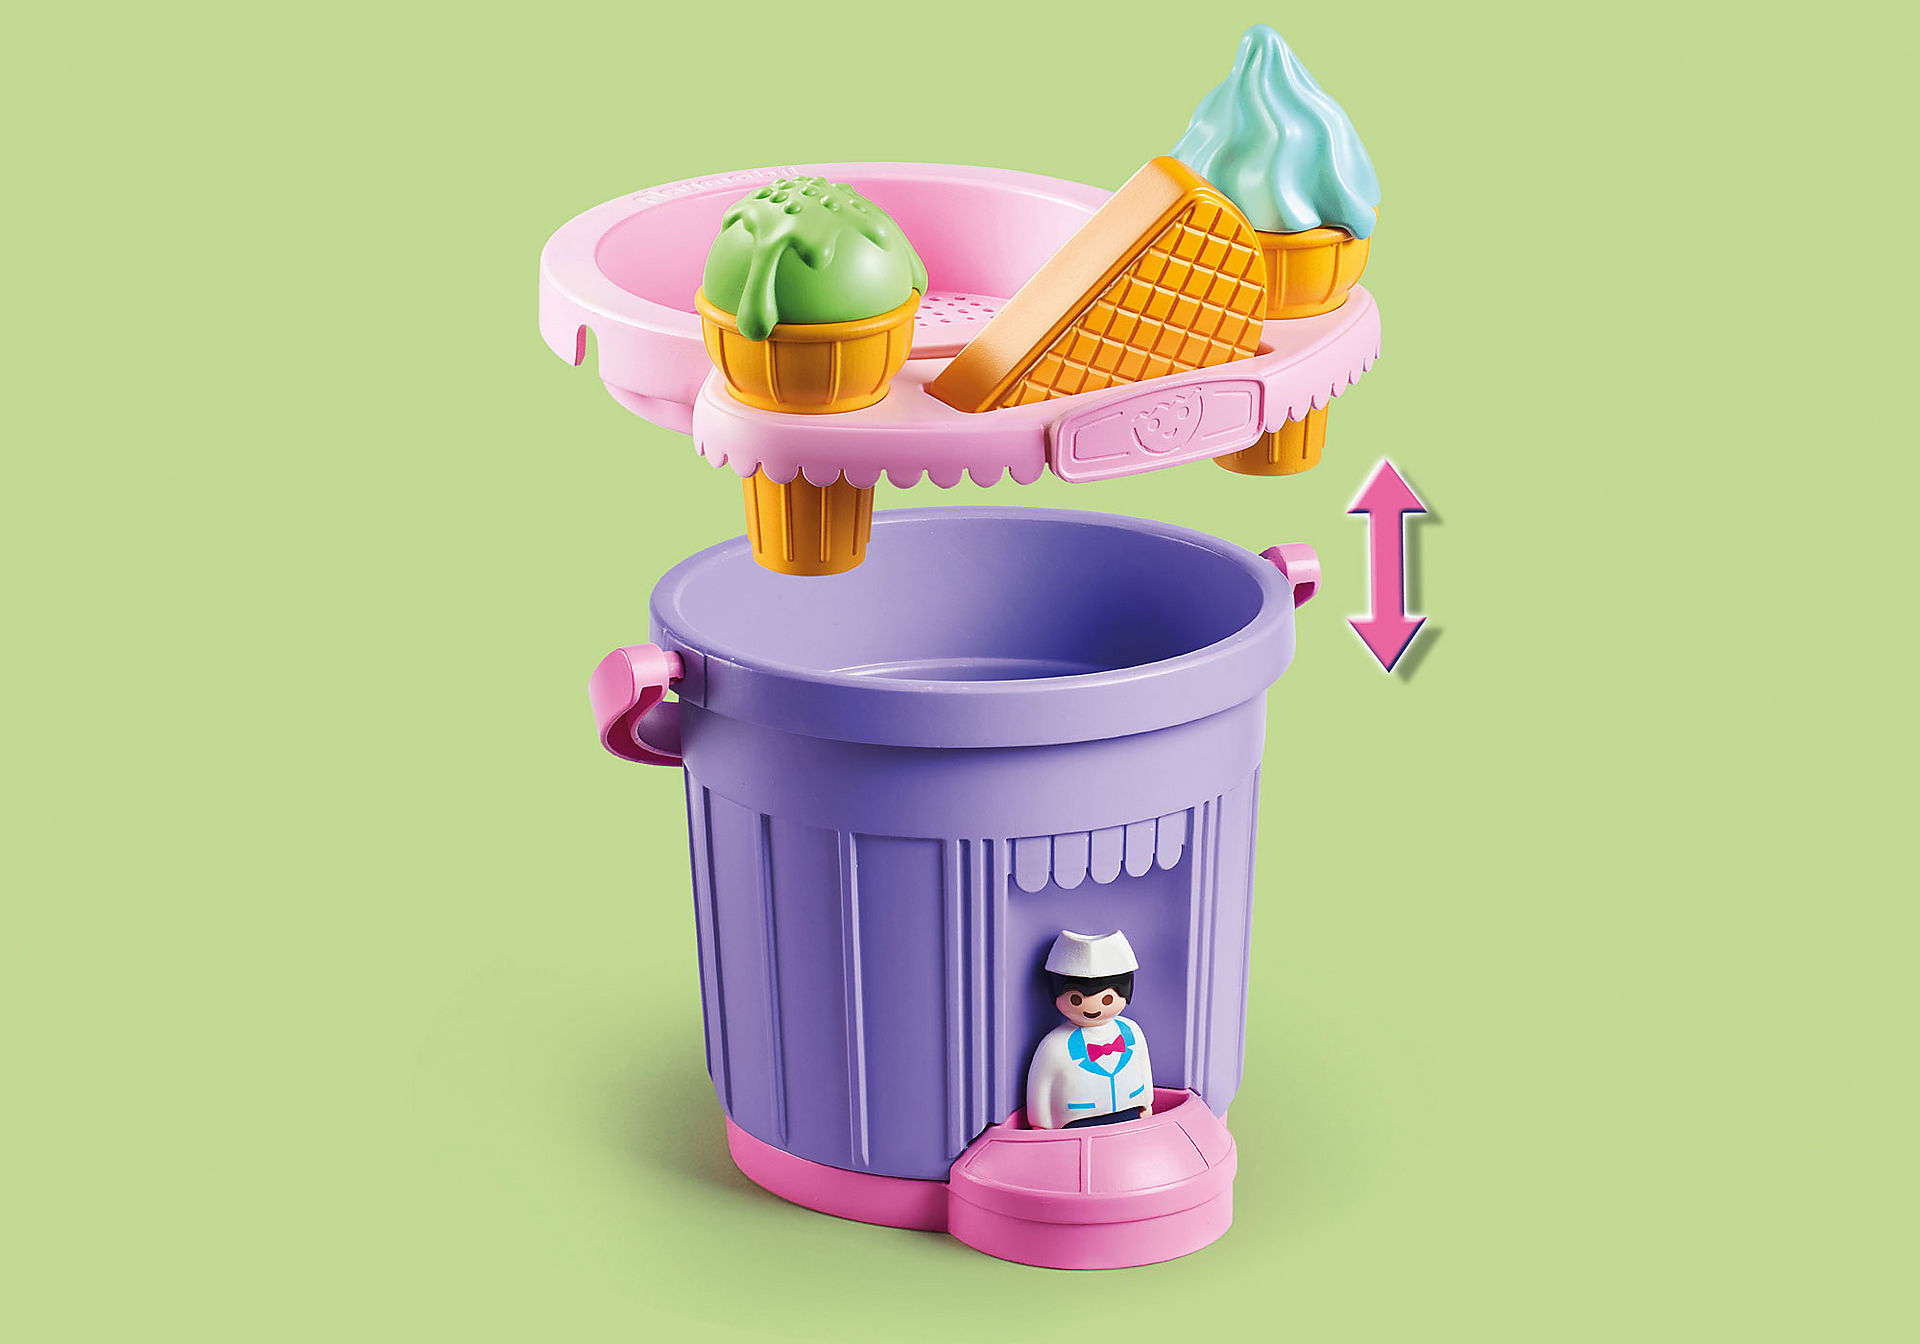 9406 Ice Cream Shop Sand Bucket zoom image10